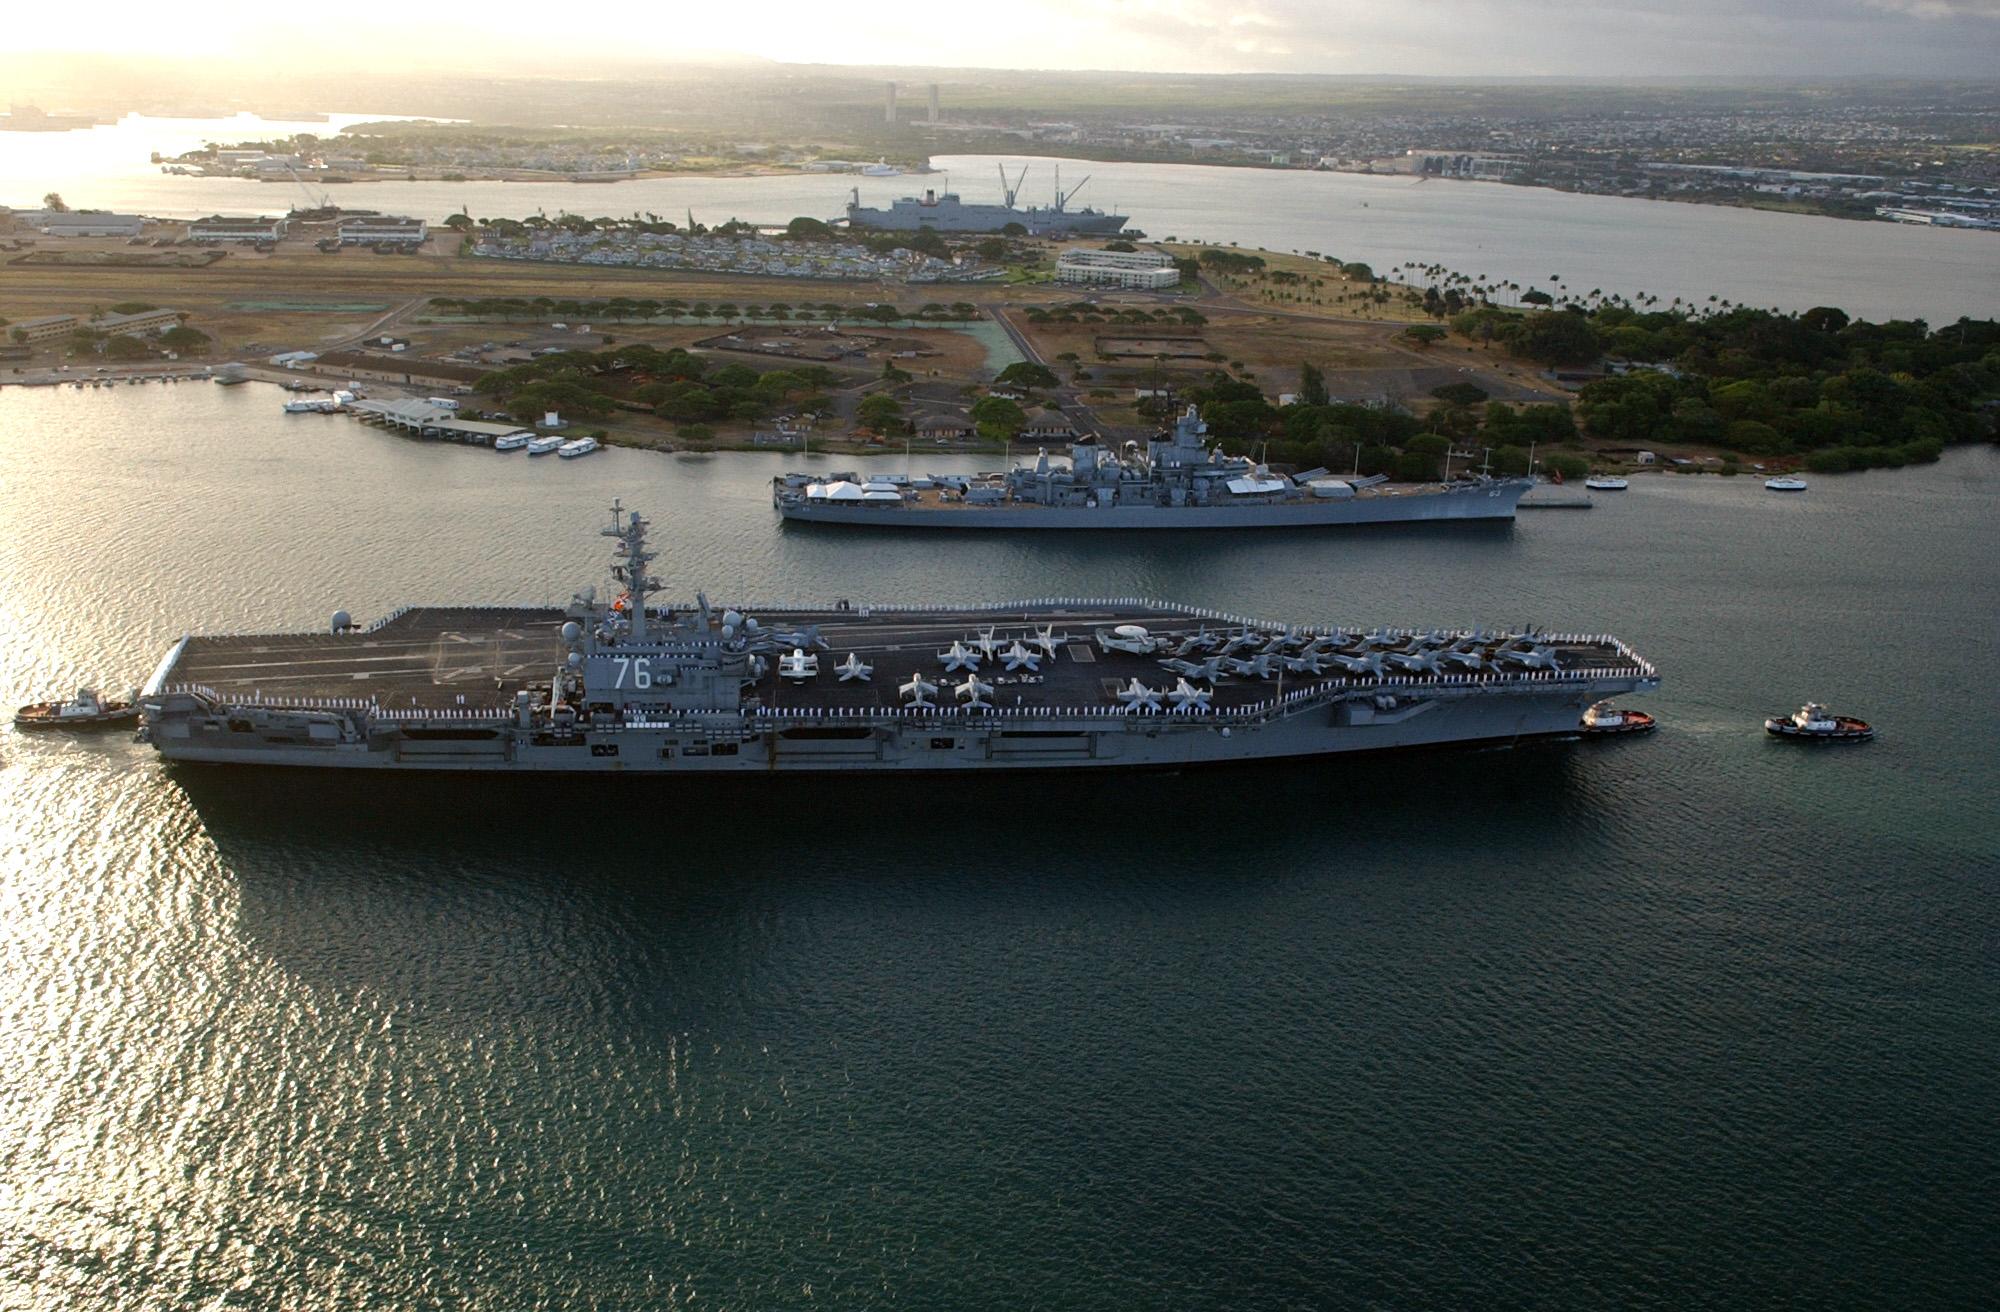 Battleship - Review of Battleship North Carolina ...